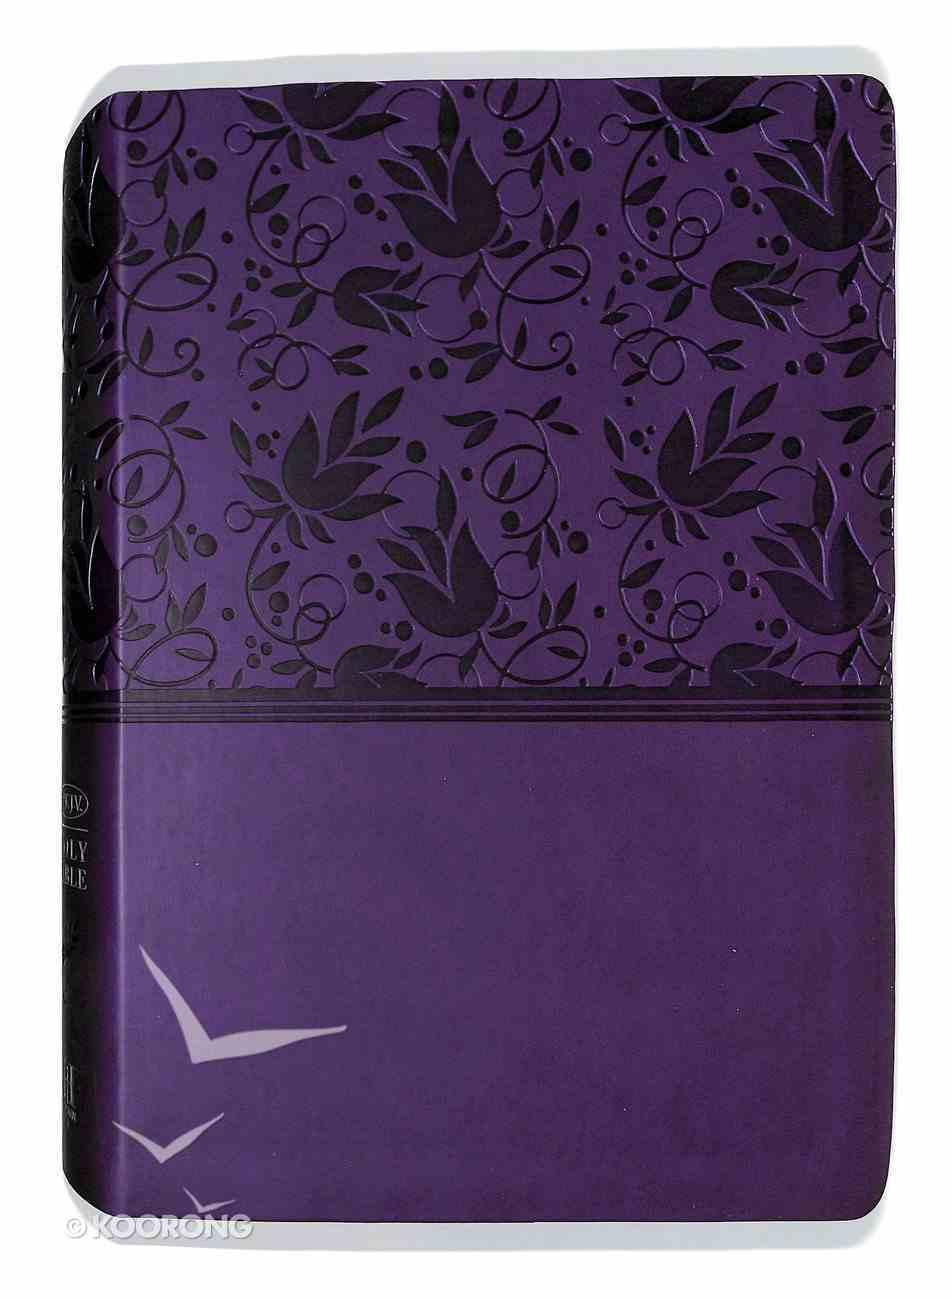 NKJV Super Giant Print Reference Bible Purple Premium Imitation Leather